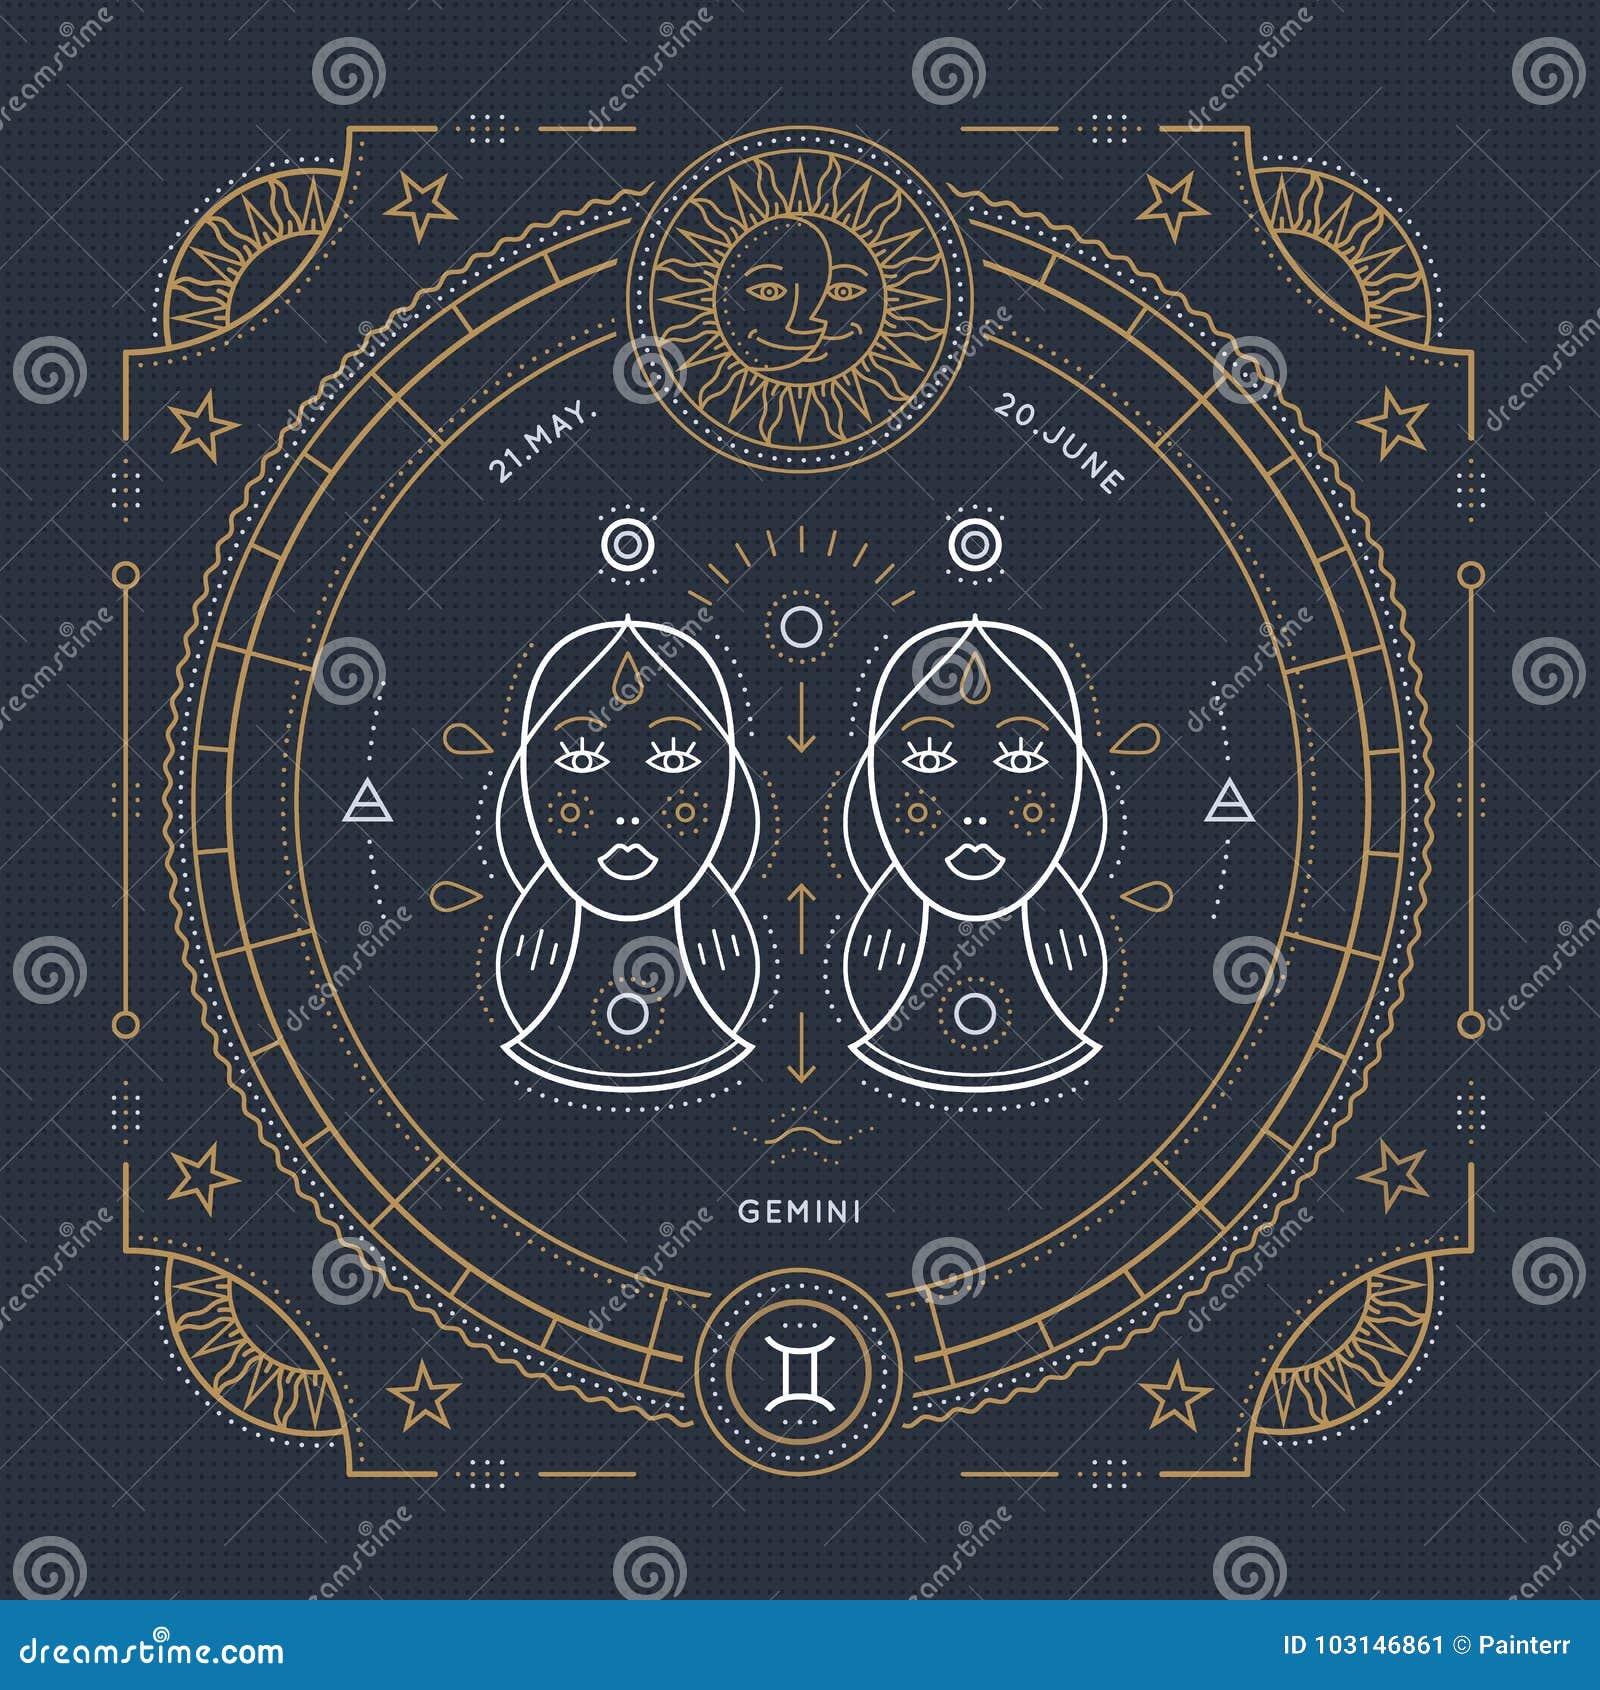 Vintage thin line Gemini zodiac sign label. Retro vector astrological symbol, mystic, sacred geometry element, emblem